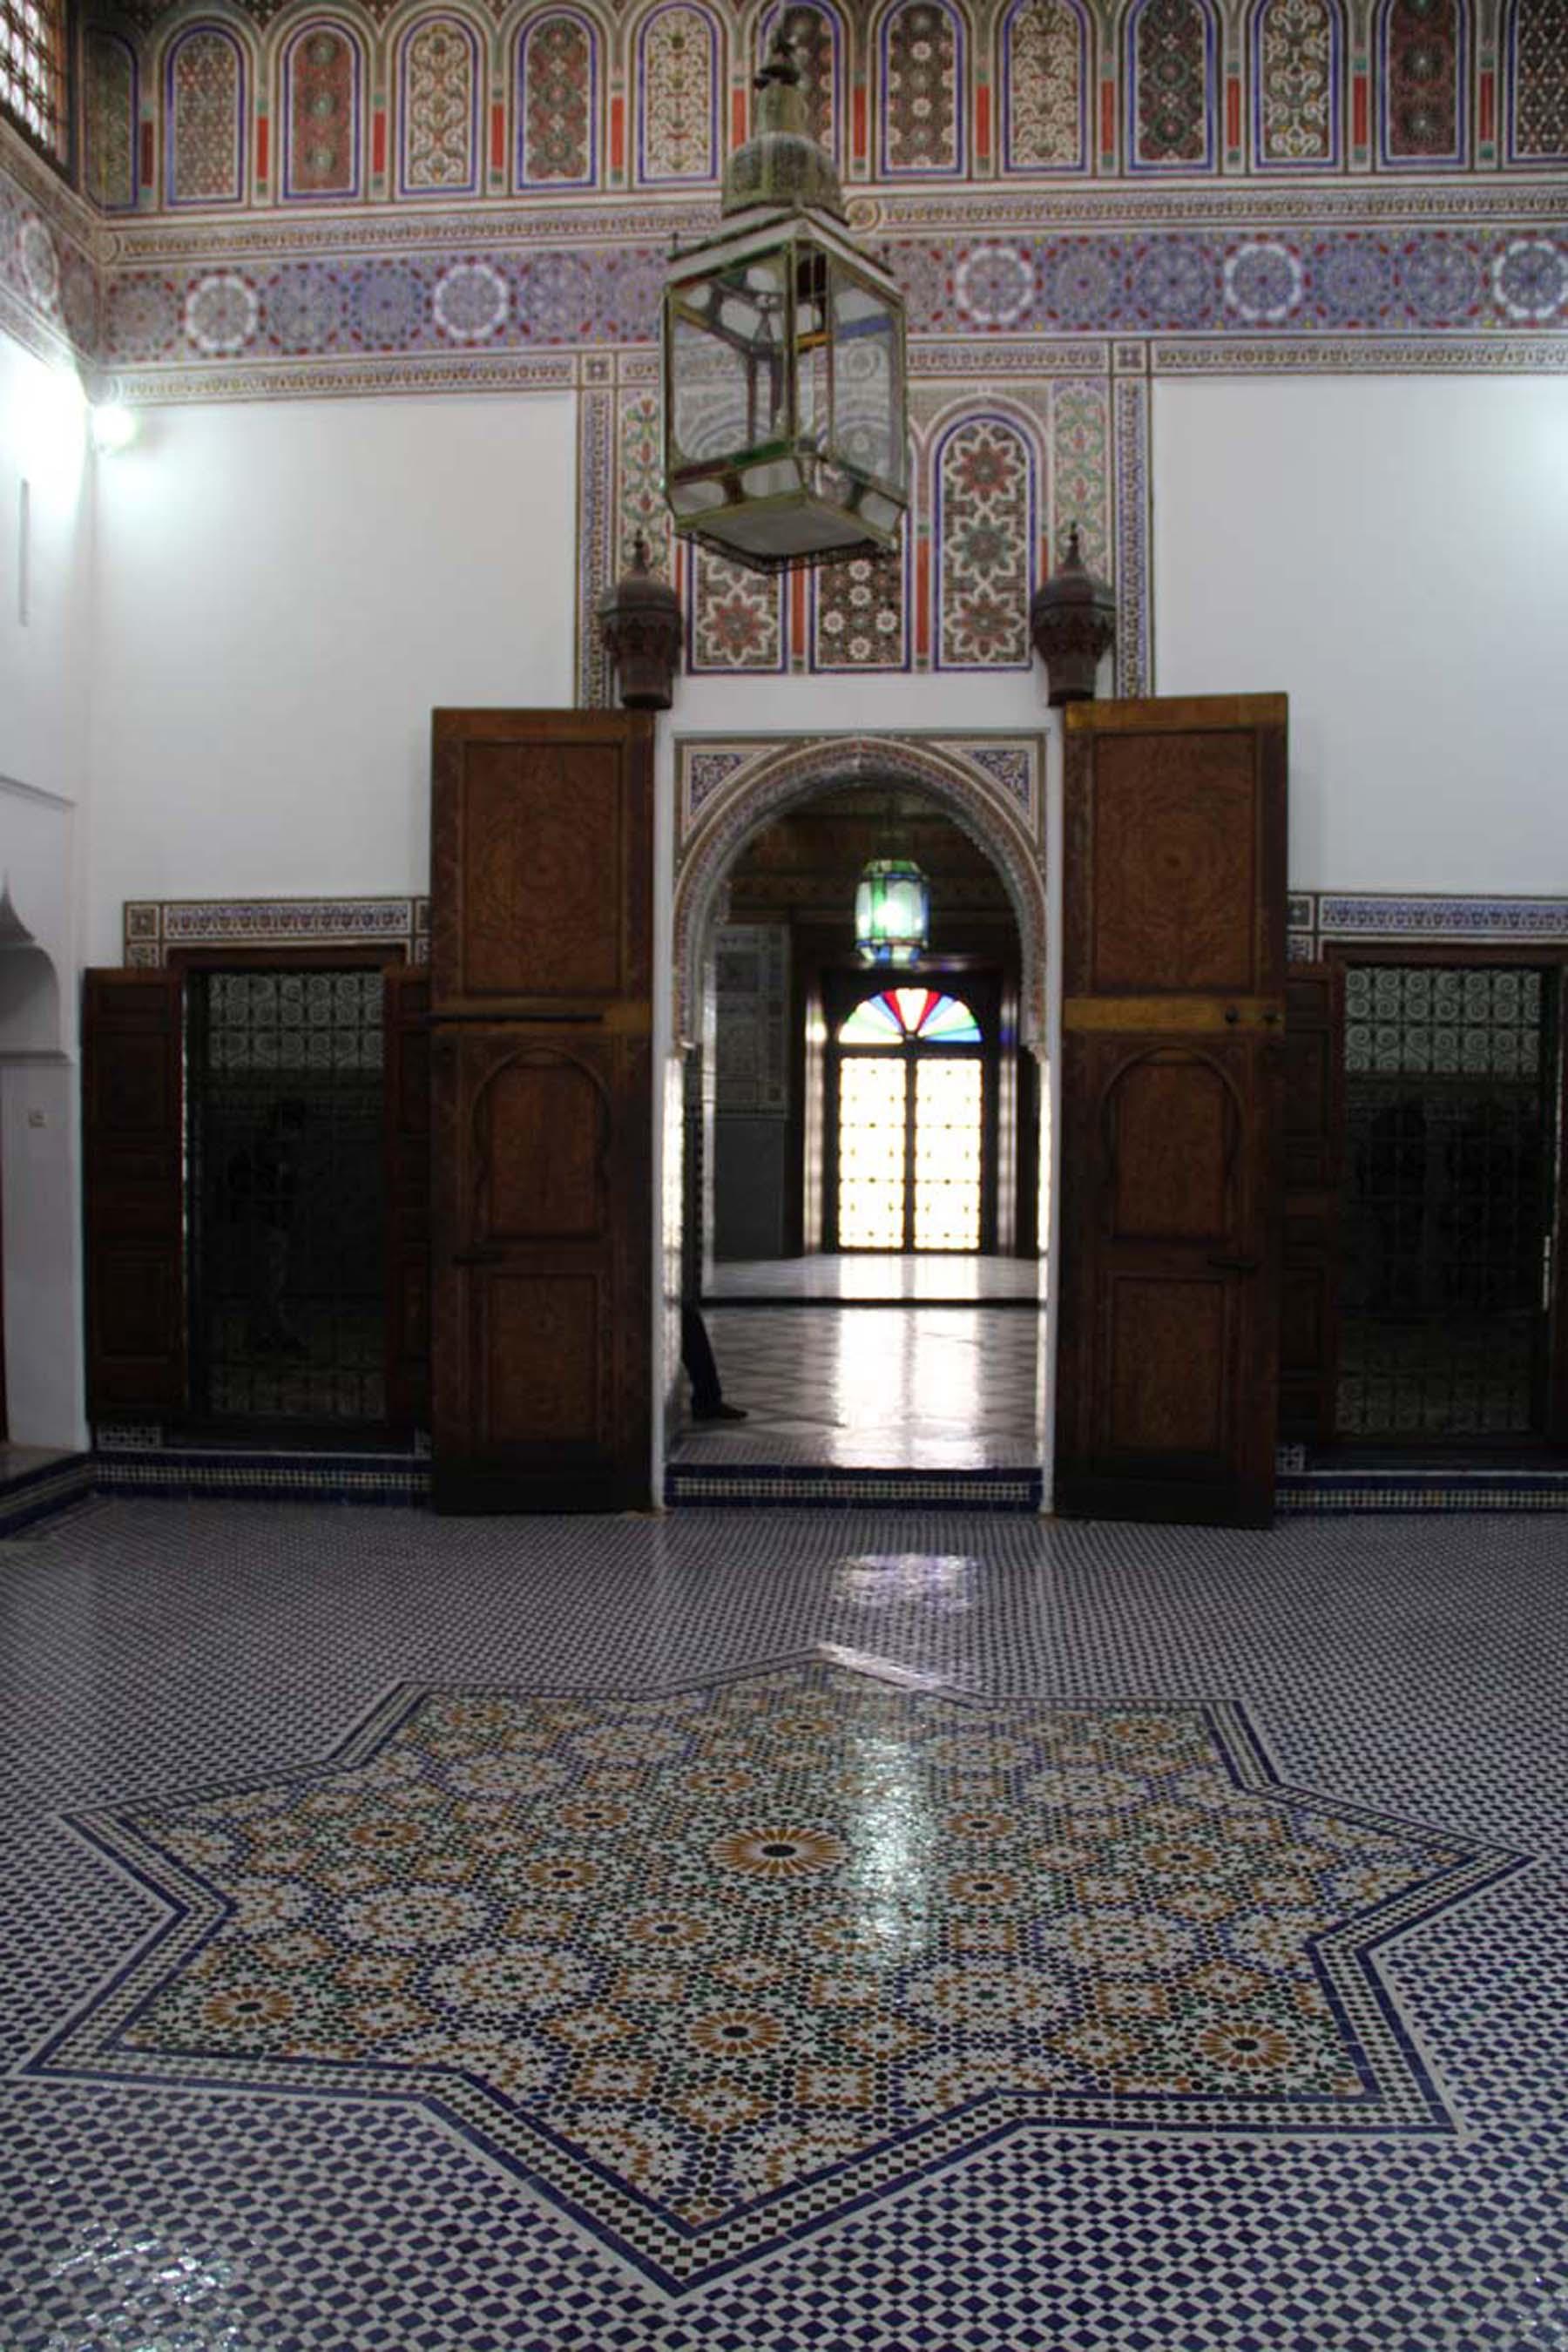 Marrakech Dar Si Said nuptial room